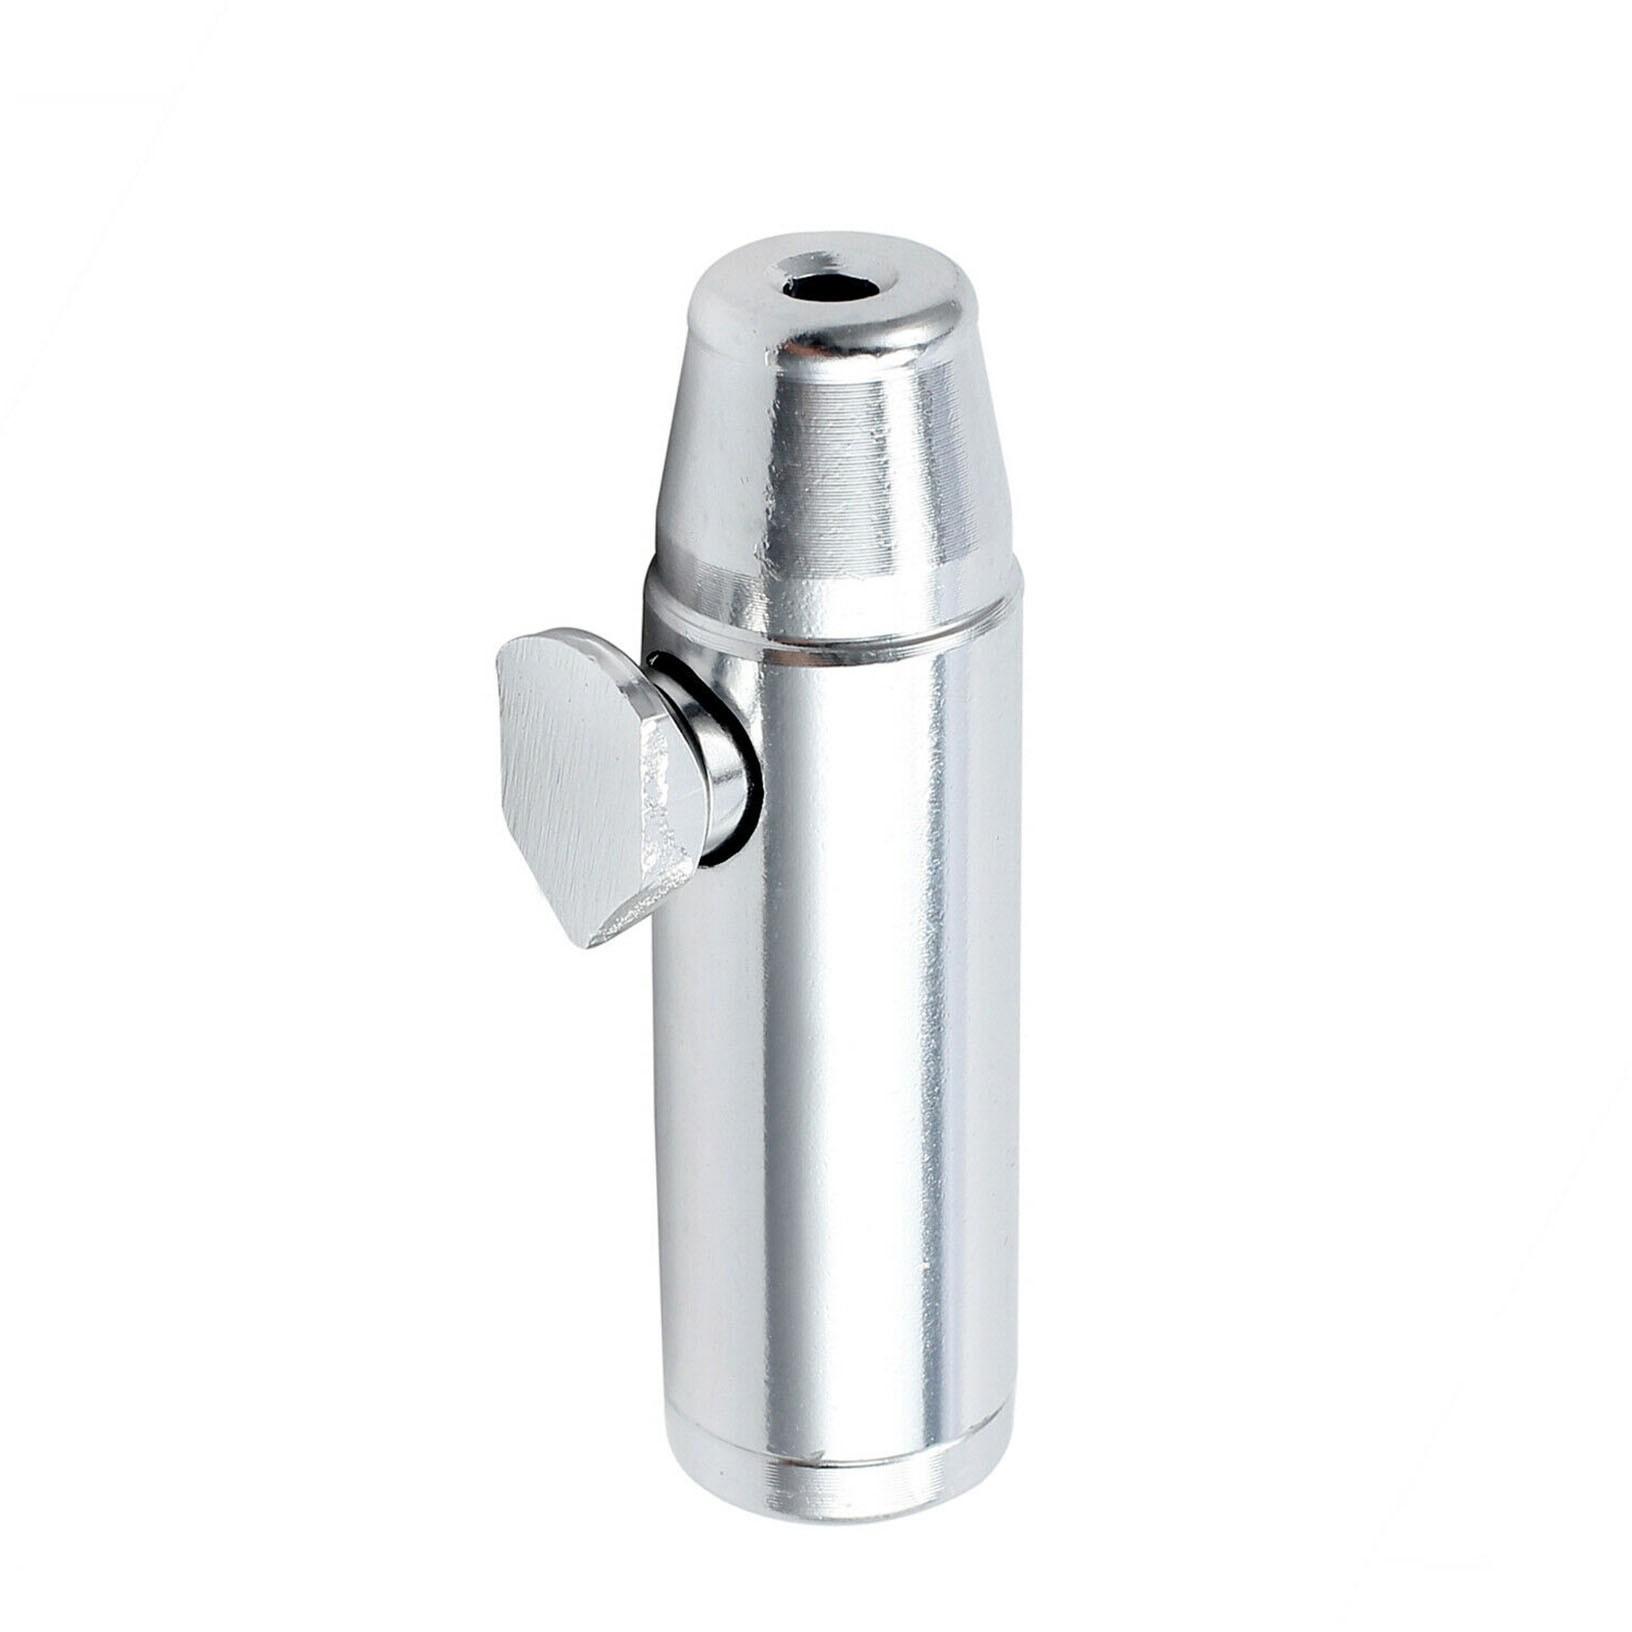 Dosador Snuff Bullet, inalador para rapé. Em Alumínio. 5,2cm de altura.